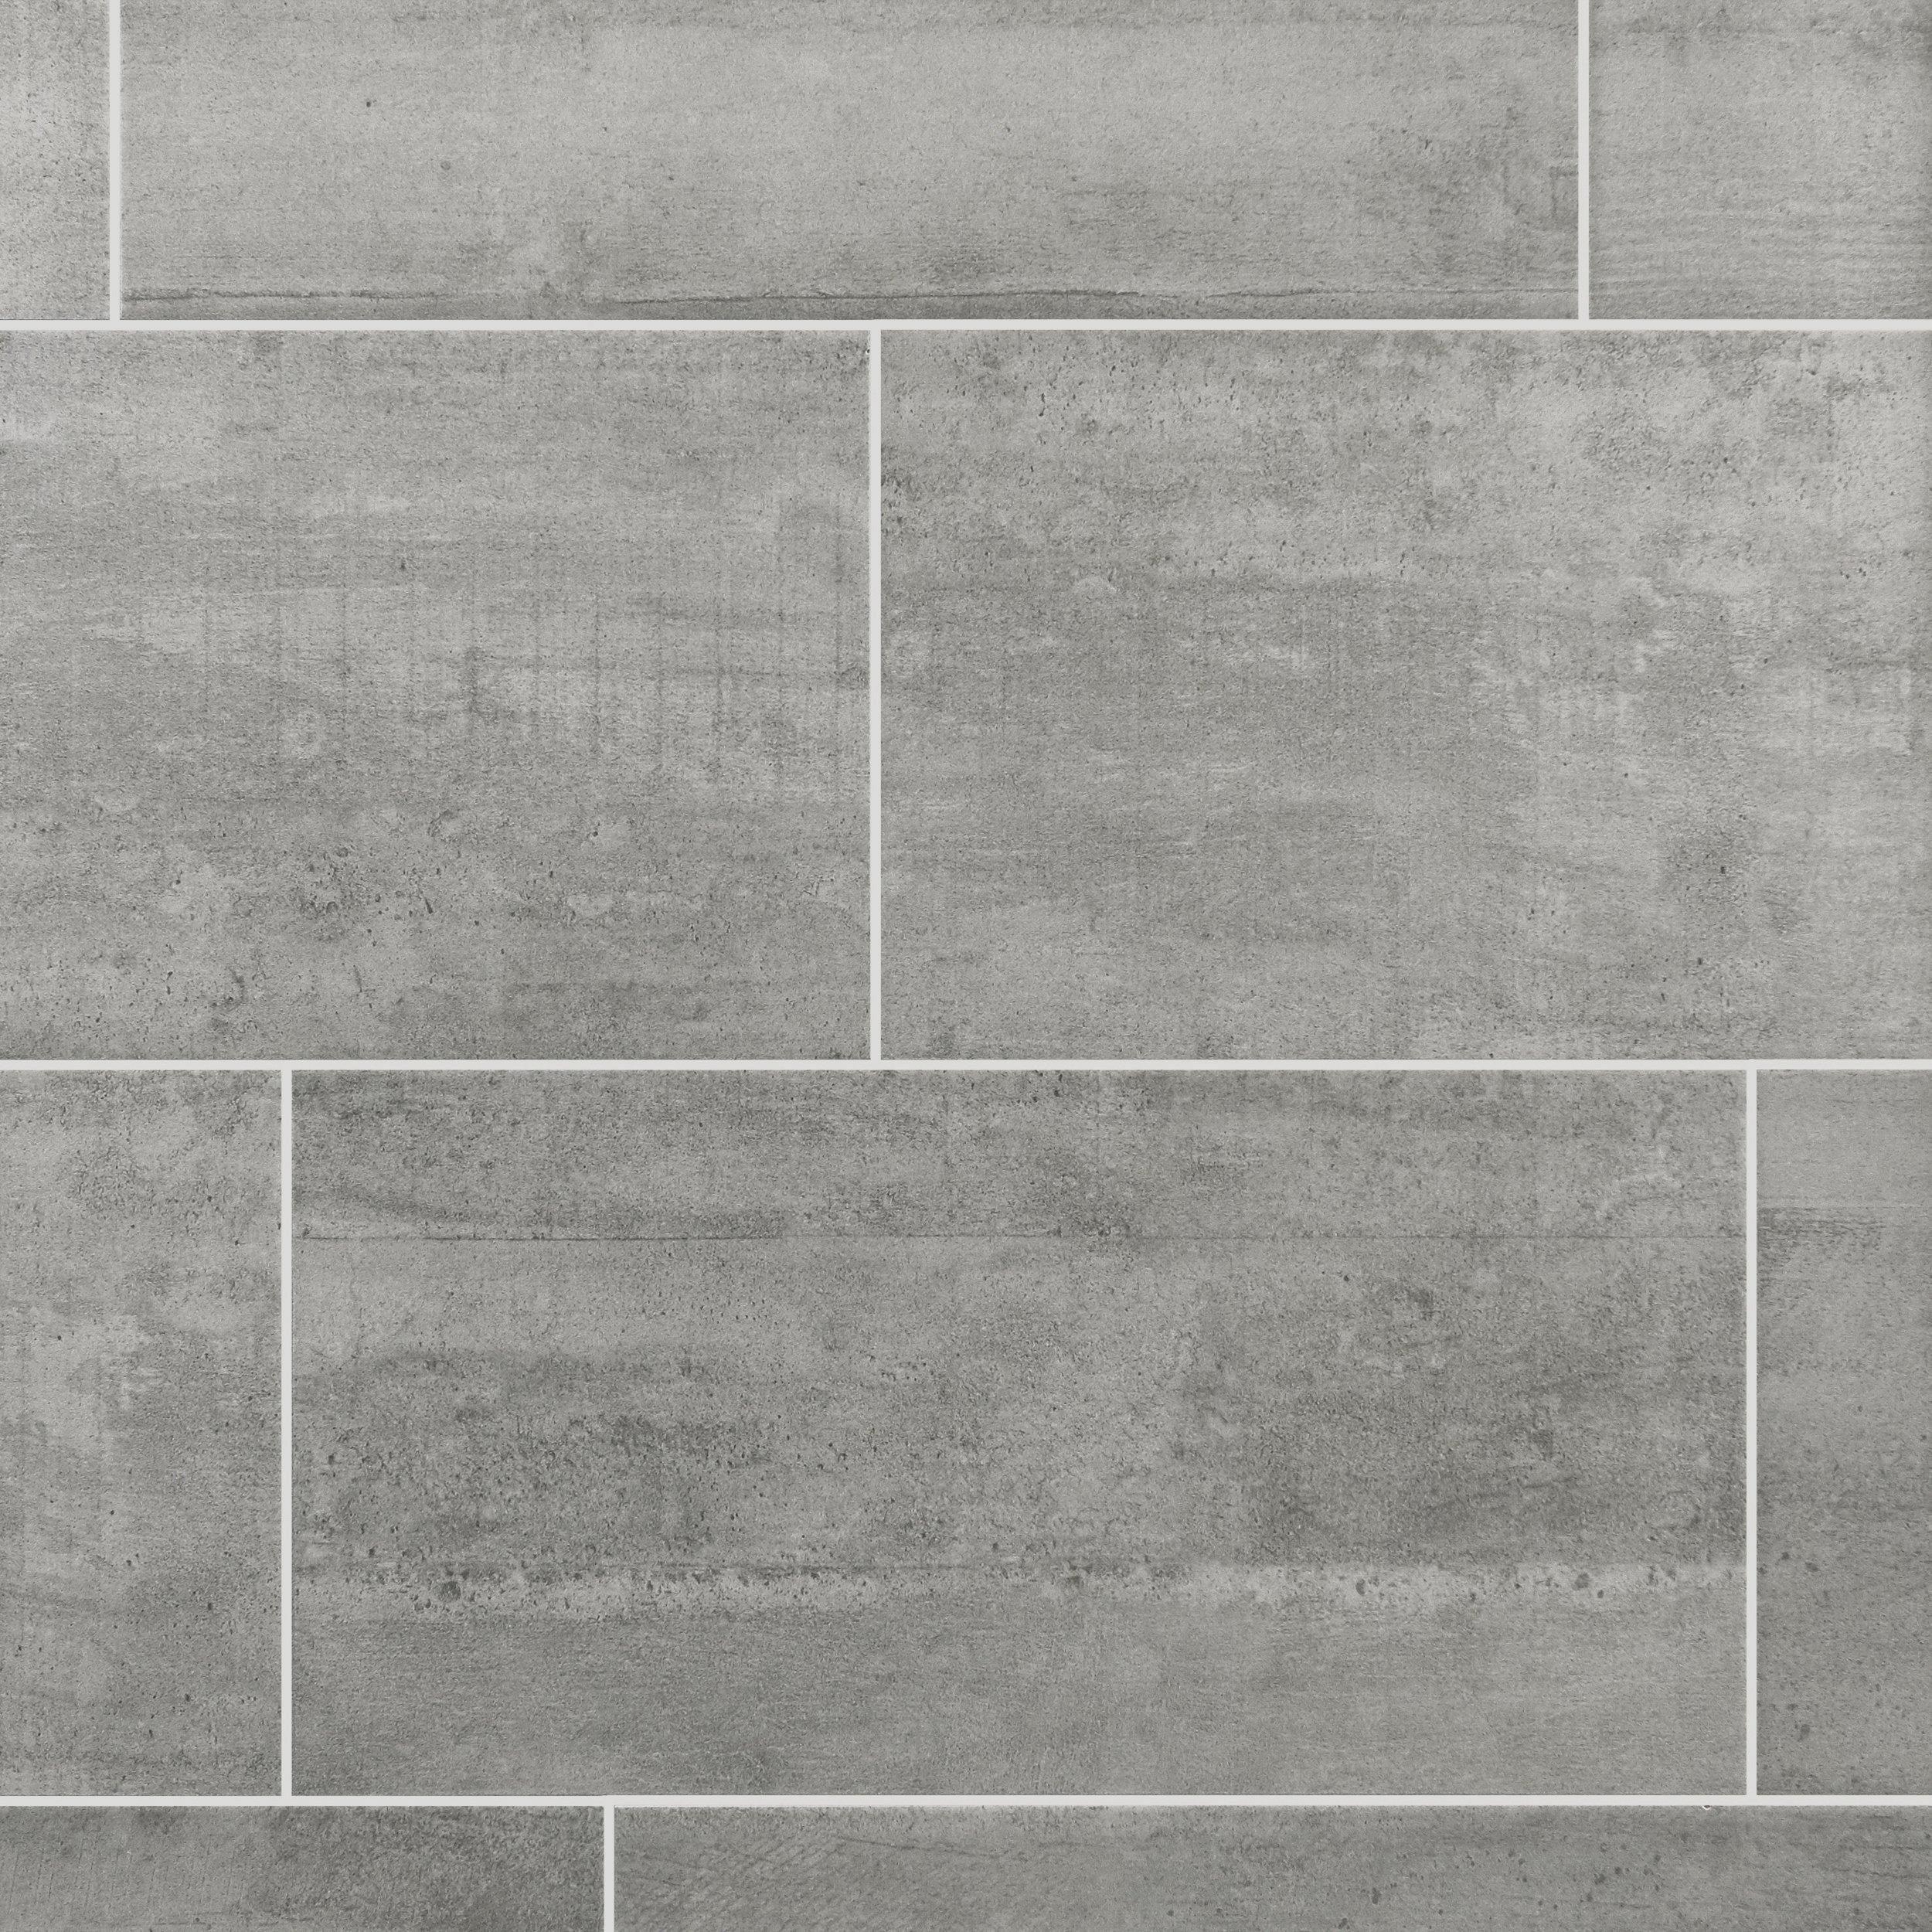 Concrete Gray Ceramic Tile Floor Decor Grey Ceramic Tile Grey Floor Tiles Ceramic Floor Tiles